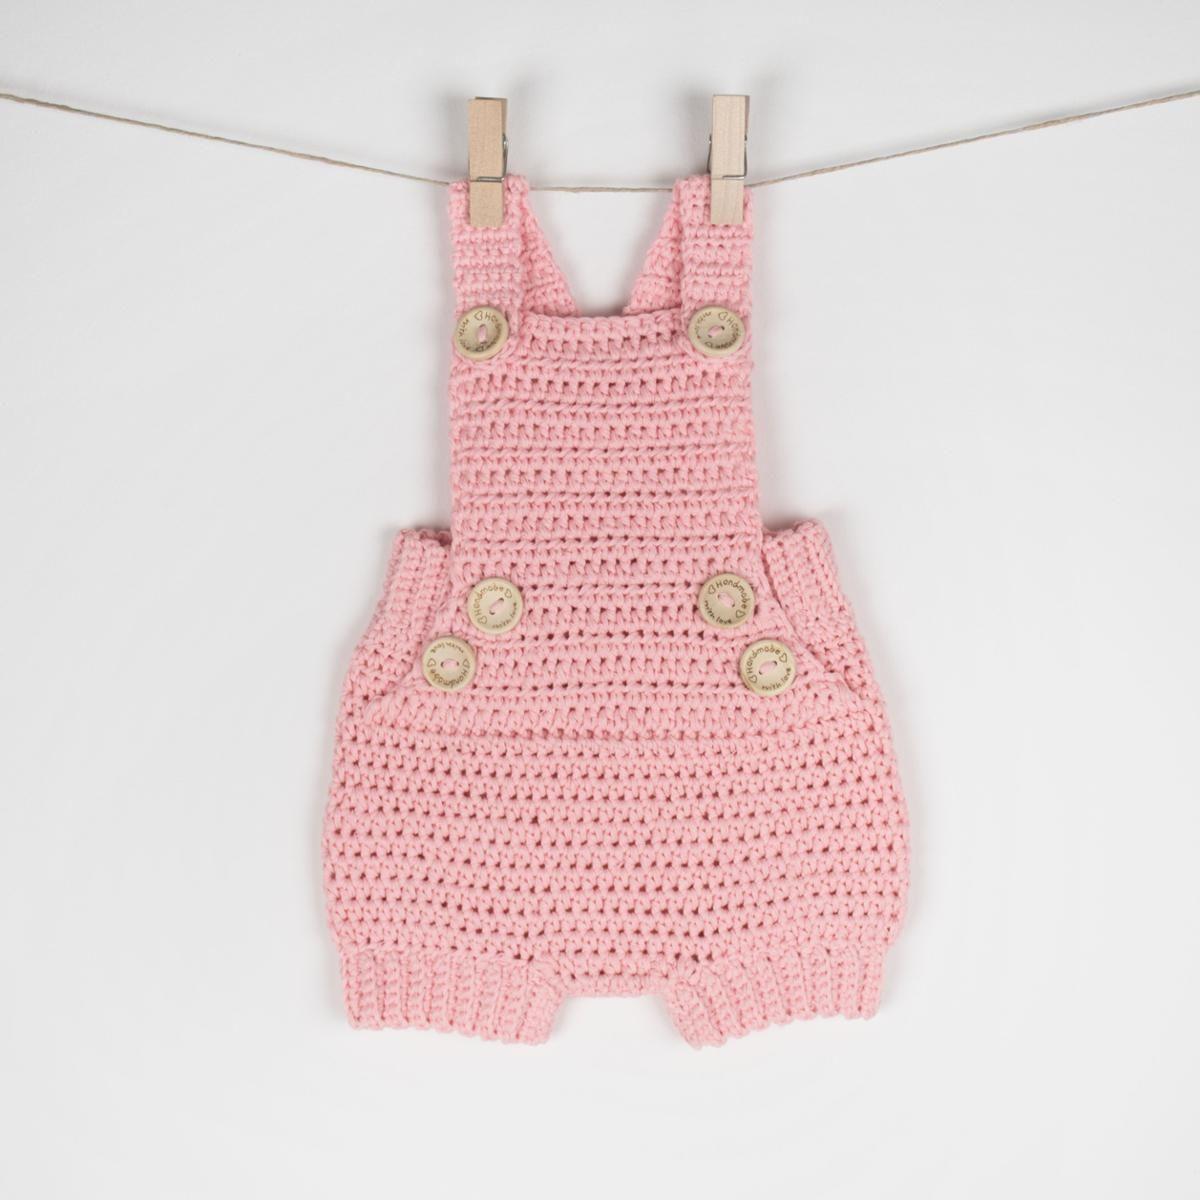 Crochet Baby Romper Onesie Pure Happiness Craftsy